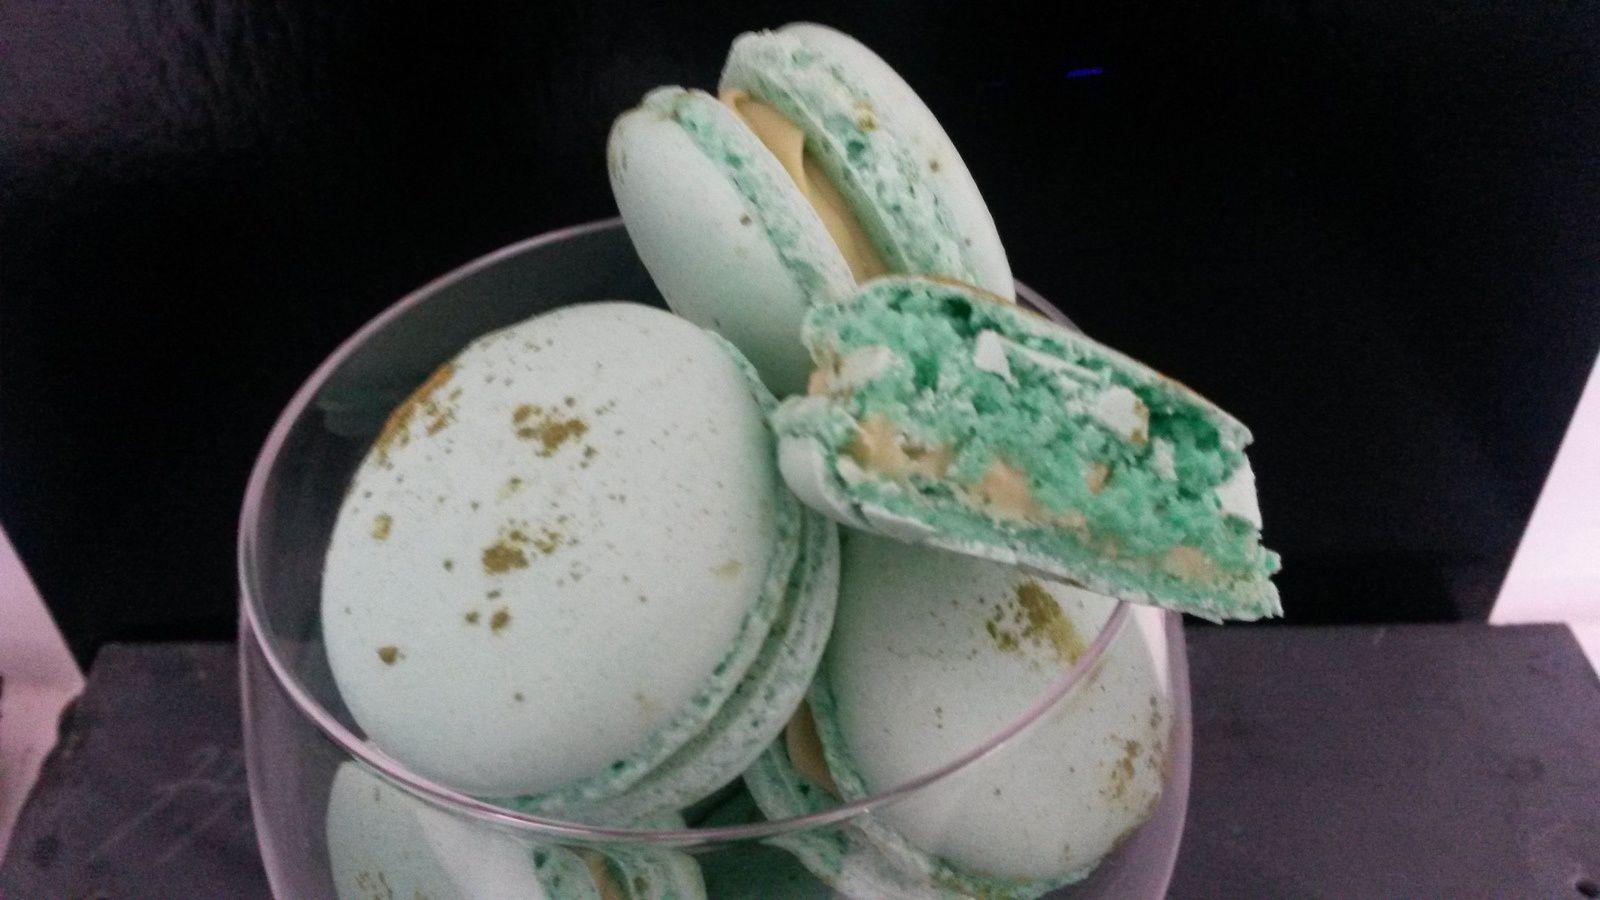 Macarons au Thé Vert Matcha - Angel's Kitchen